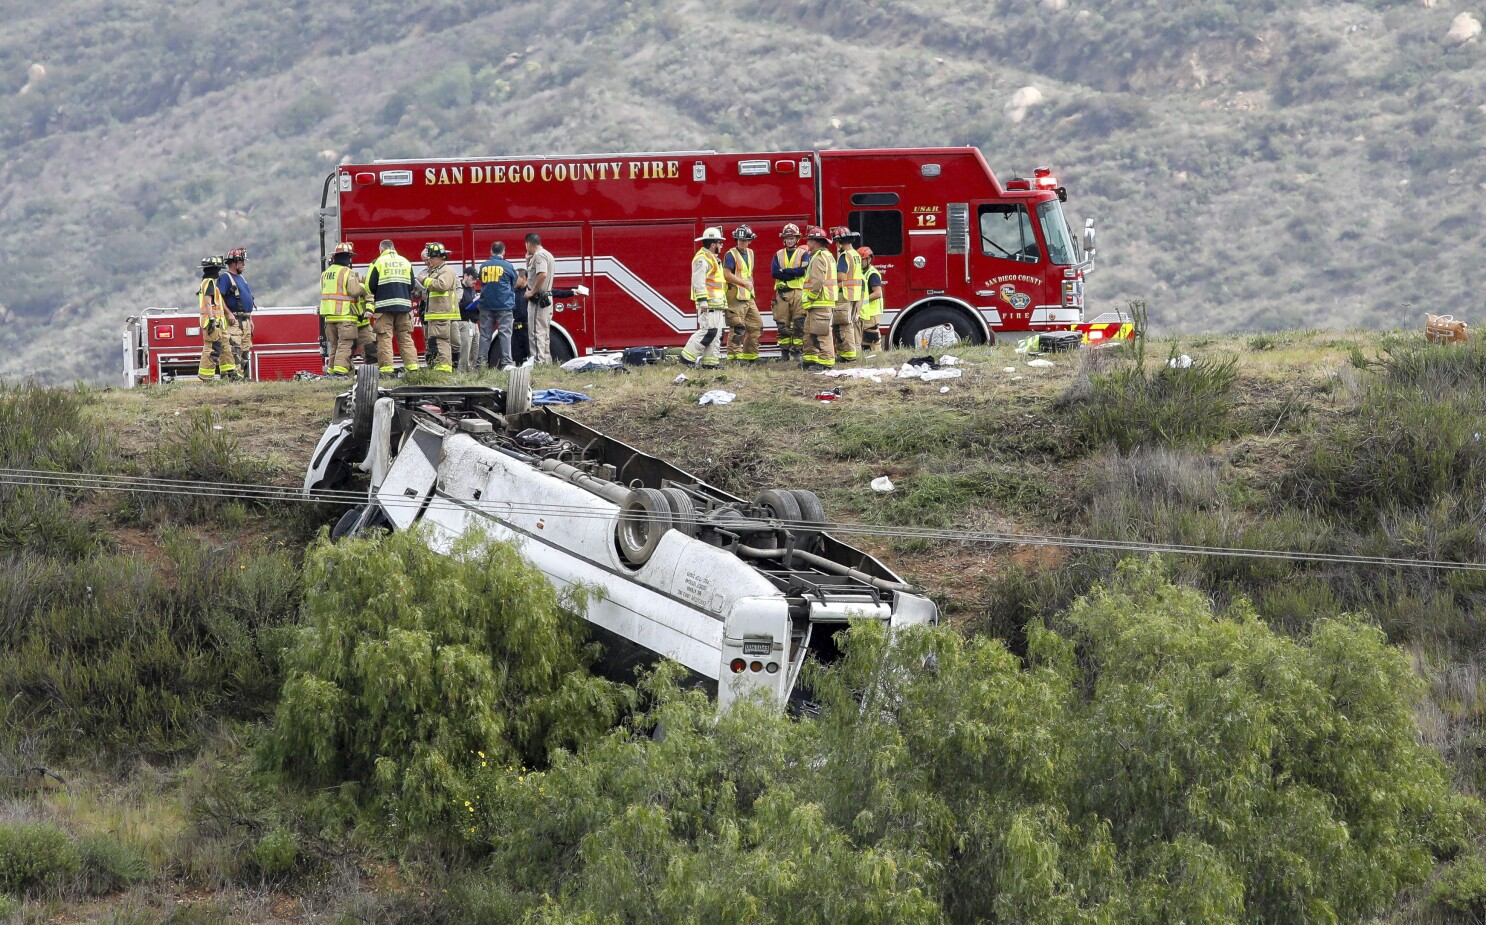 Halloween 2020 Bus Crash NTSB to investigate charter bus crash that killed 3 in San Diego